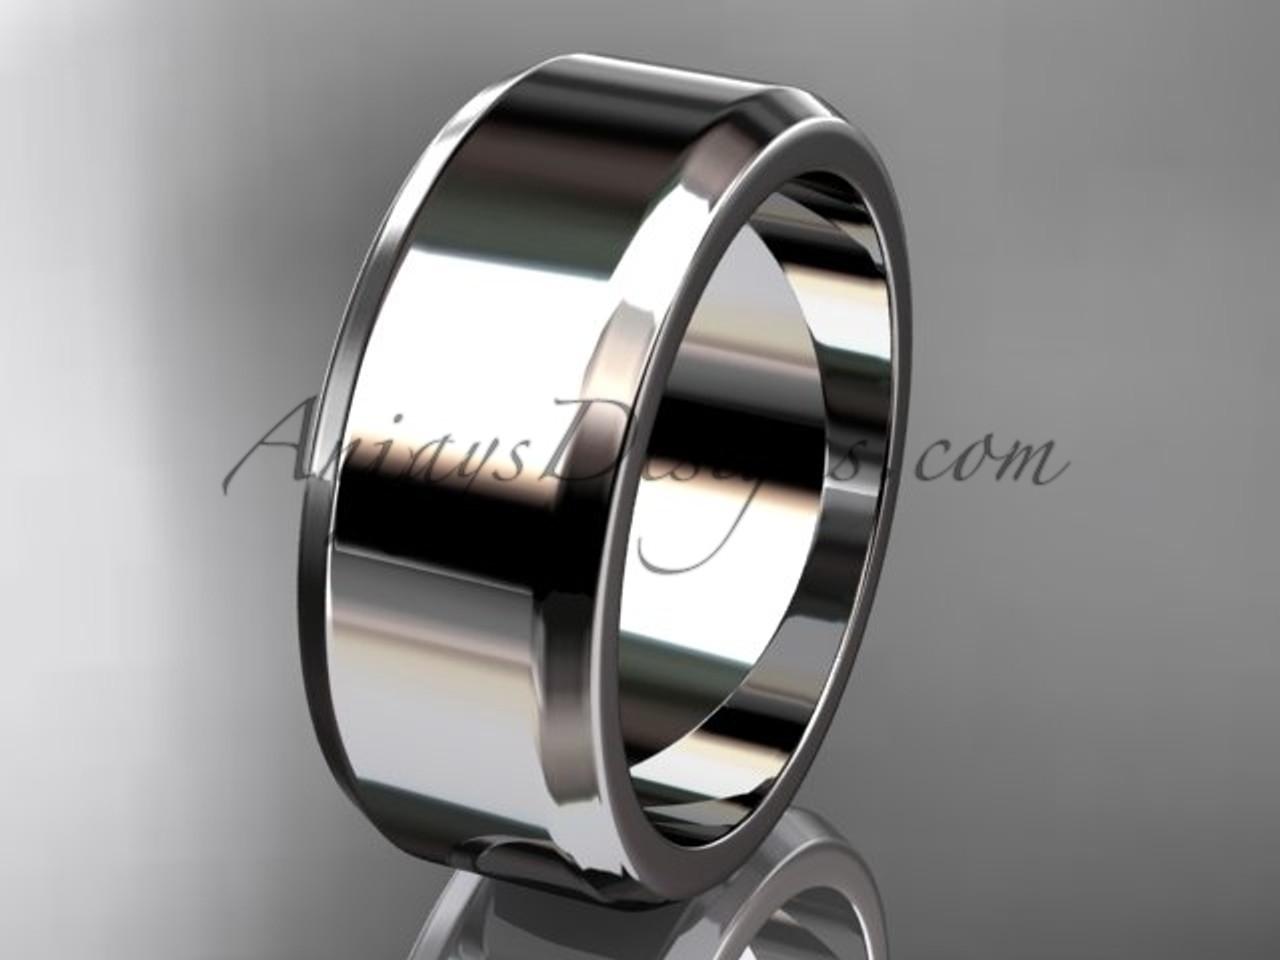 Platinum Wedding Bands For Men.Platinum Plain 8mm Wide Engagement Rings For Men Wb50708g